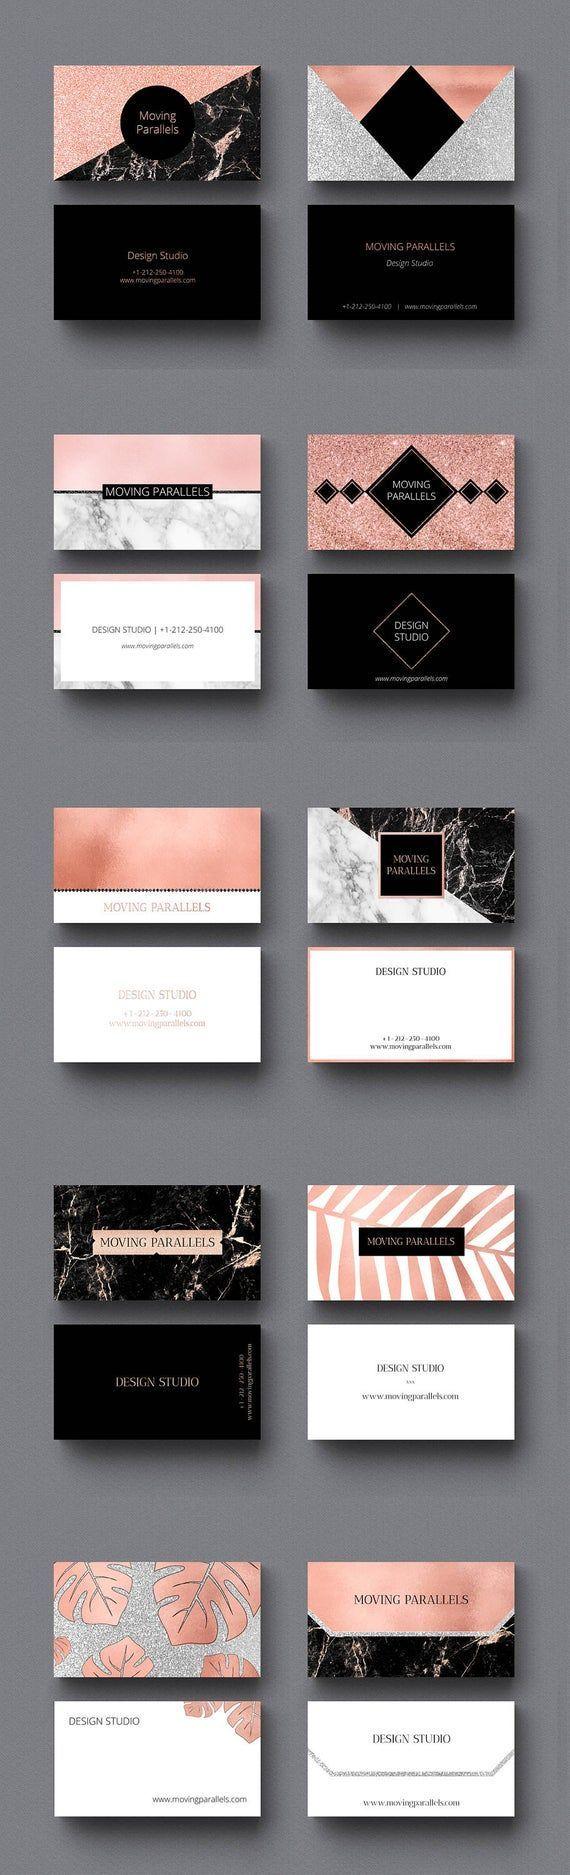 Neu Fotografien Visitenkarten Schwarz Strategien Ausgefallenevisitenkarten Coolevisit Visitenkarten Visitenkarten Kostenlos Visitenkarten Vorlagen